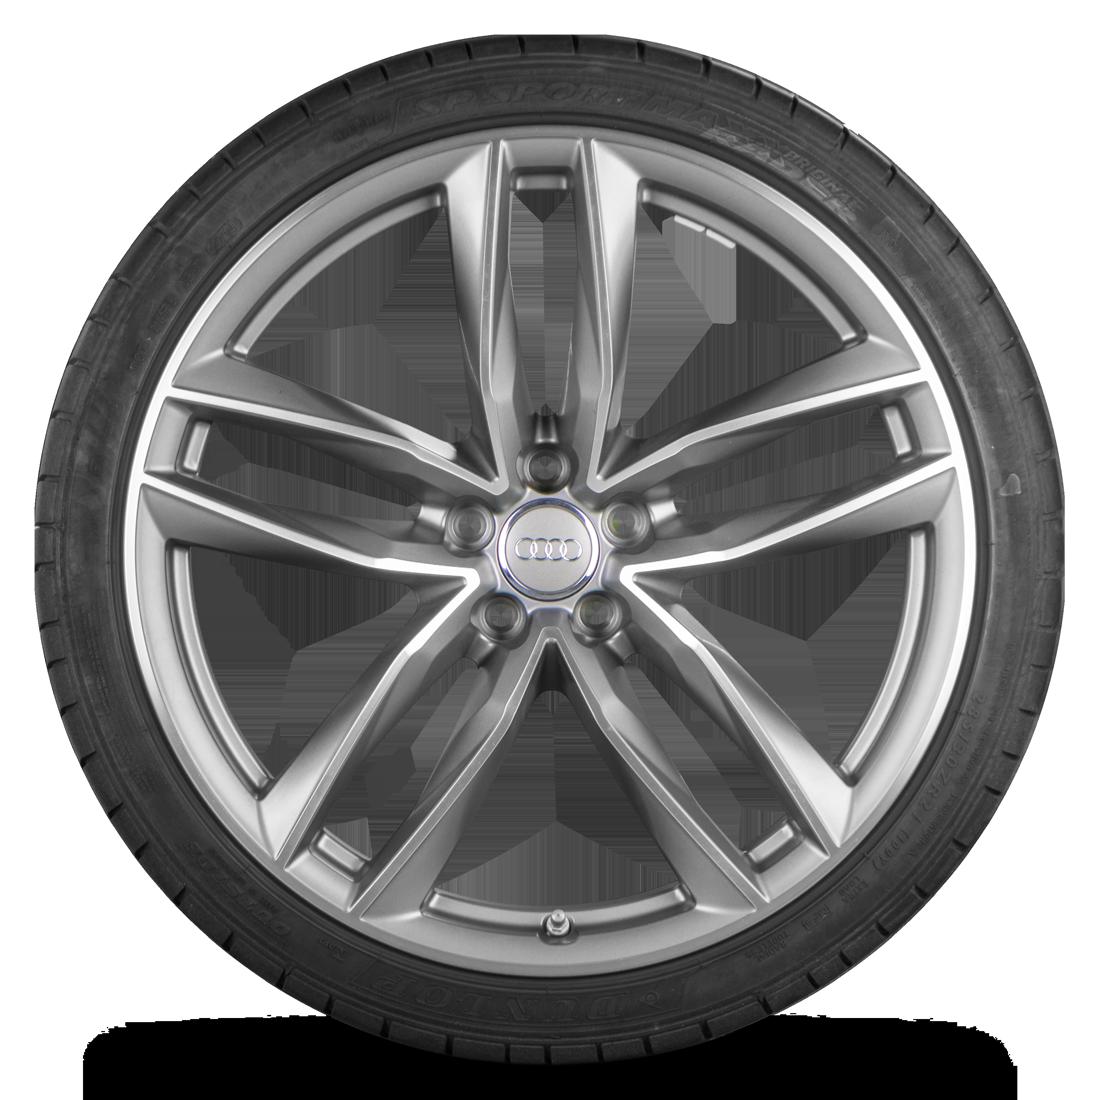 Audi RS6 4G 21 Zoll Alufelgen Felgen Sommerreifen Sommerräder S line